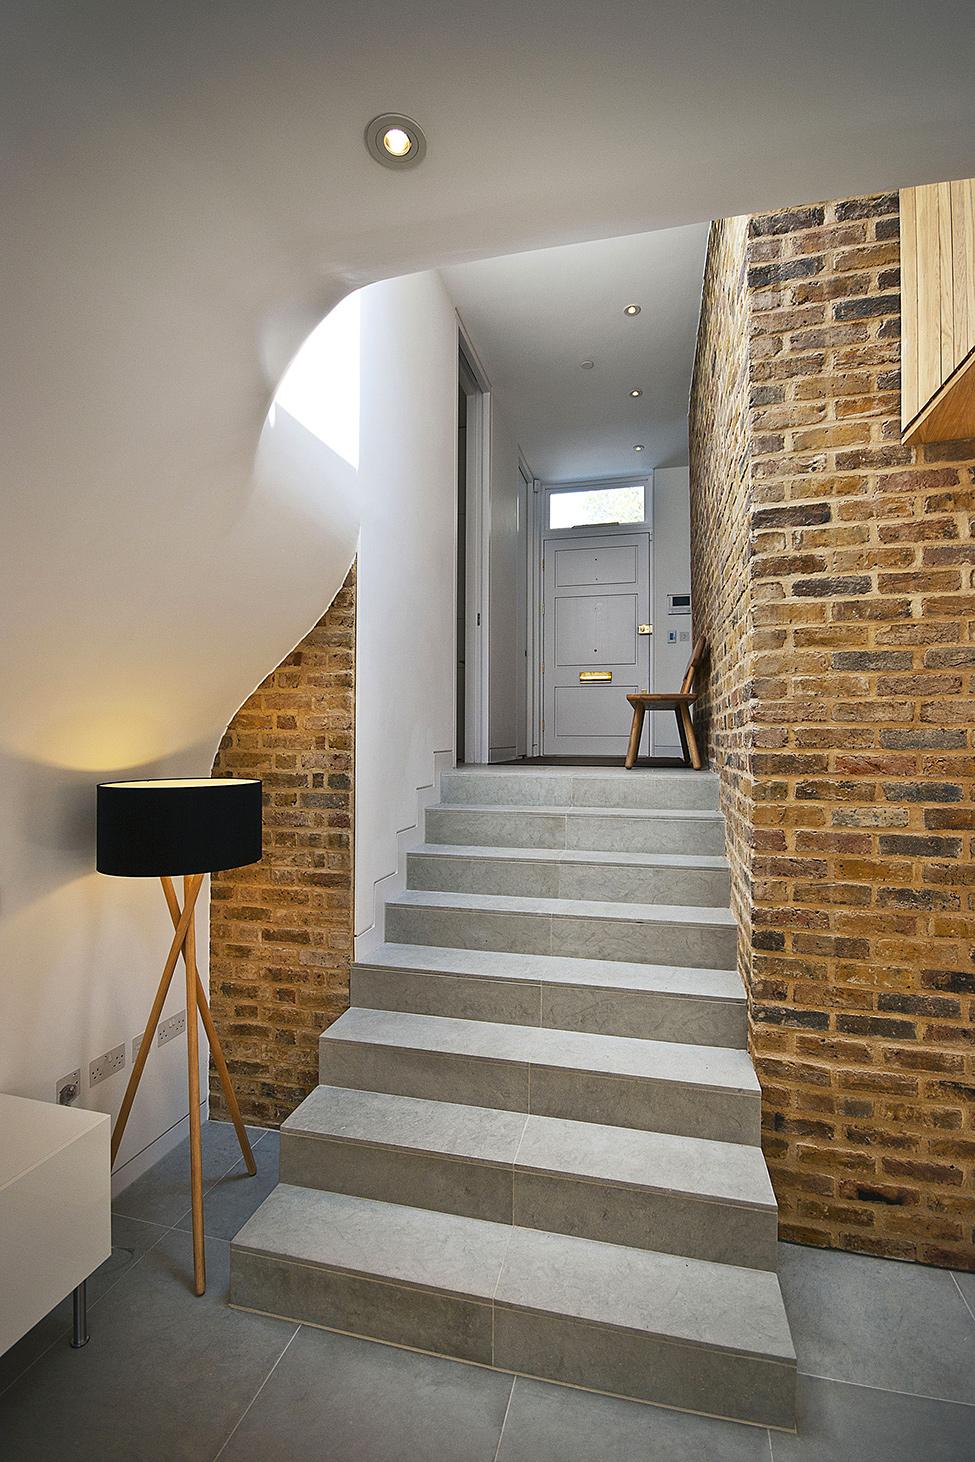 Staroj viktorijanskoj kući u Londonu dodani su novi elementi  MojStan.net